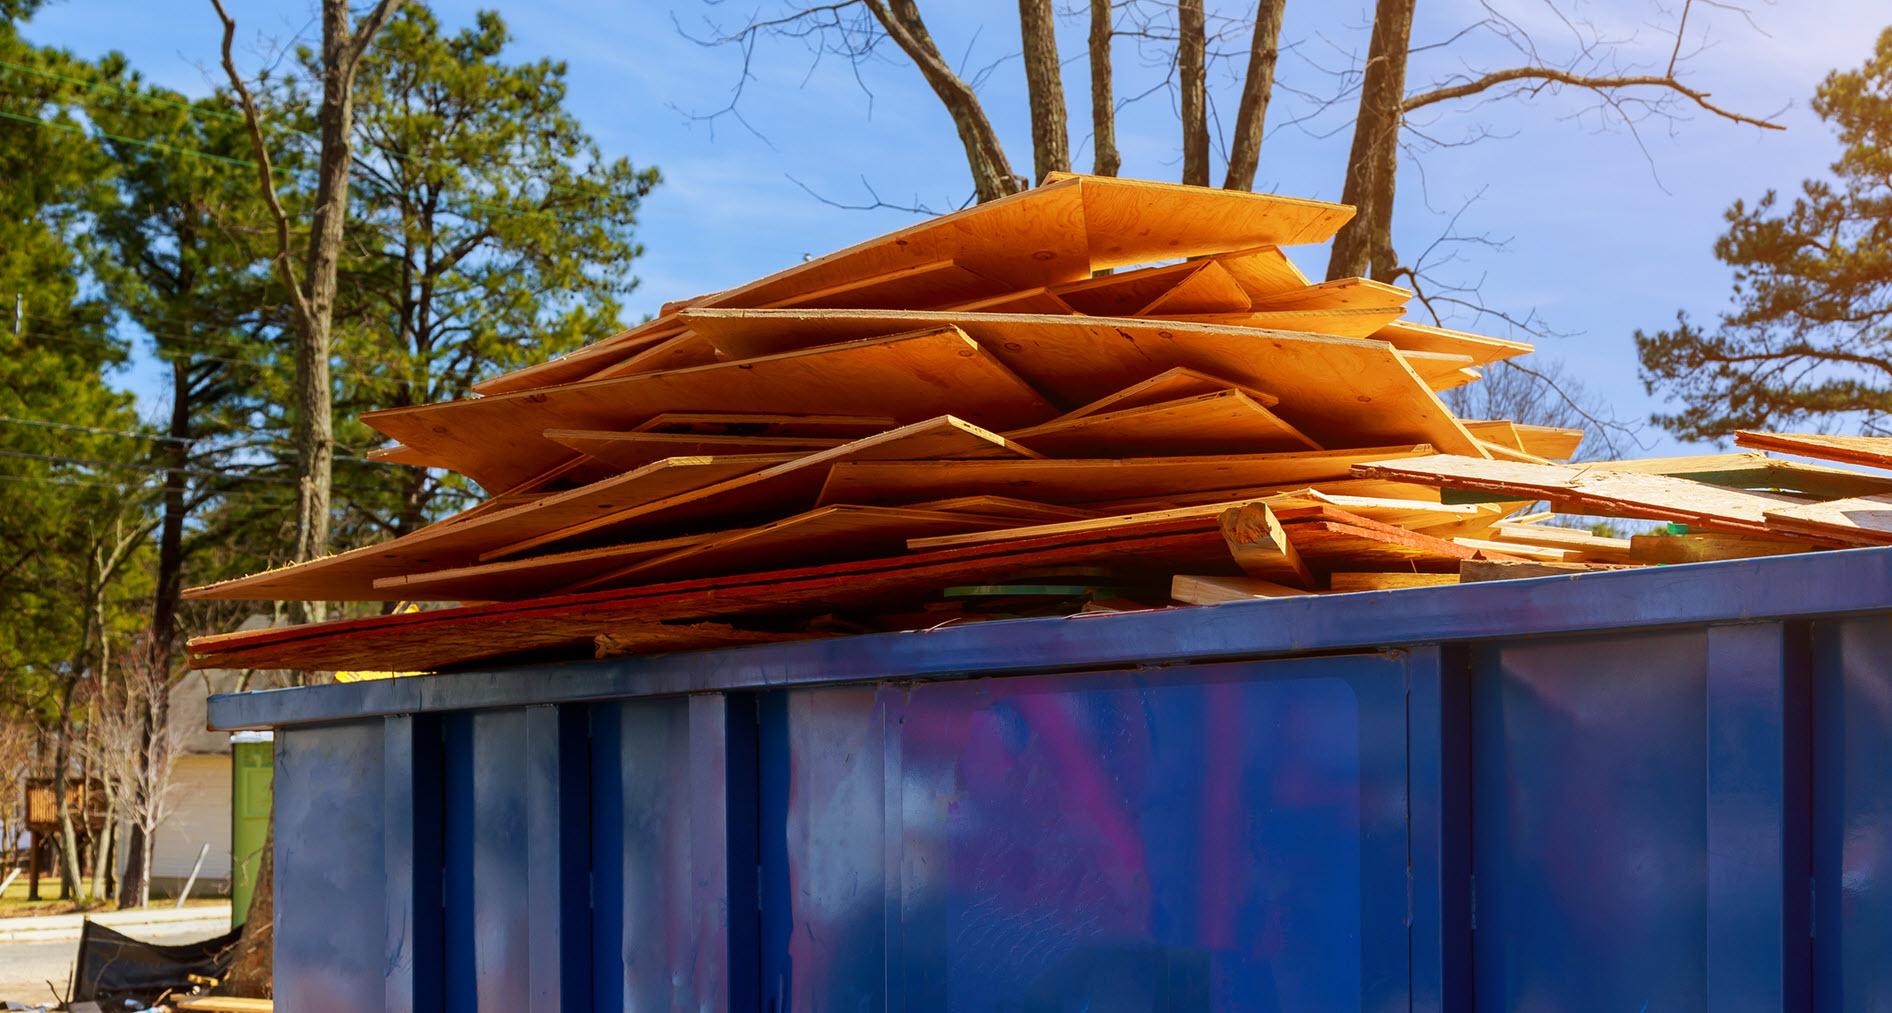 Construction & Debris Recycling